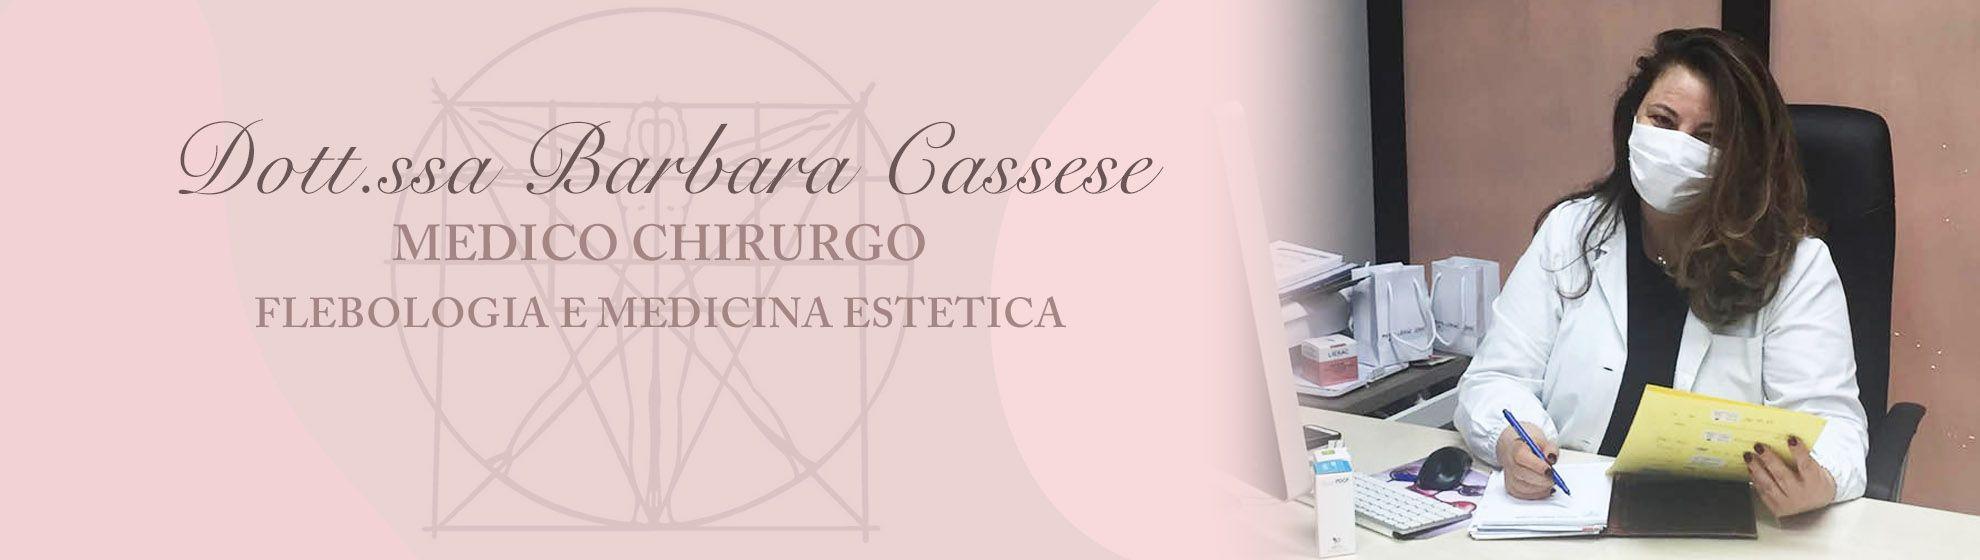 Dott.ssa Barbara Cassese